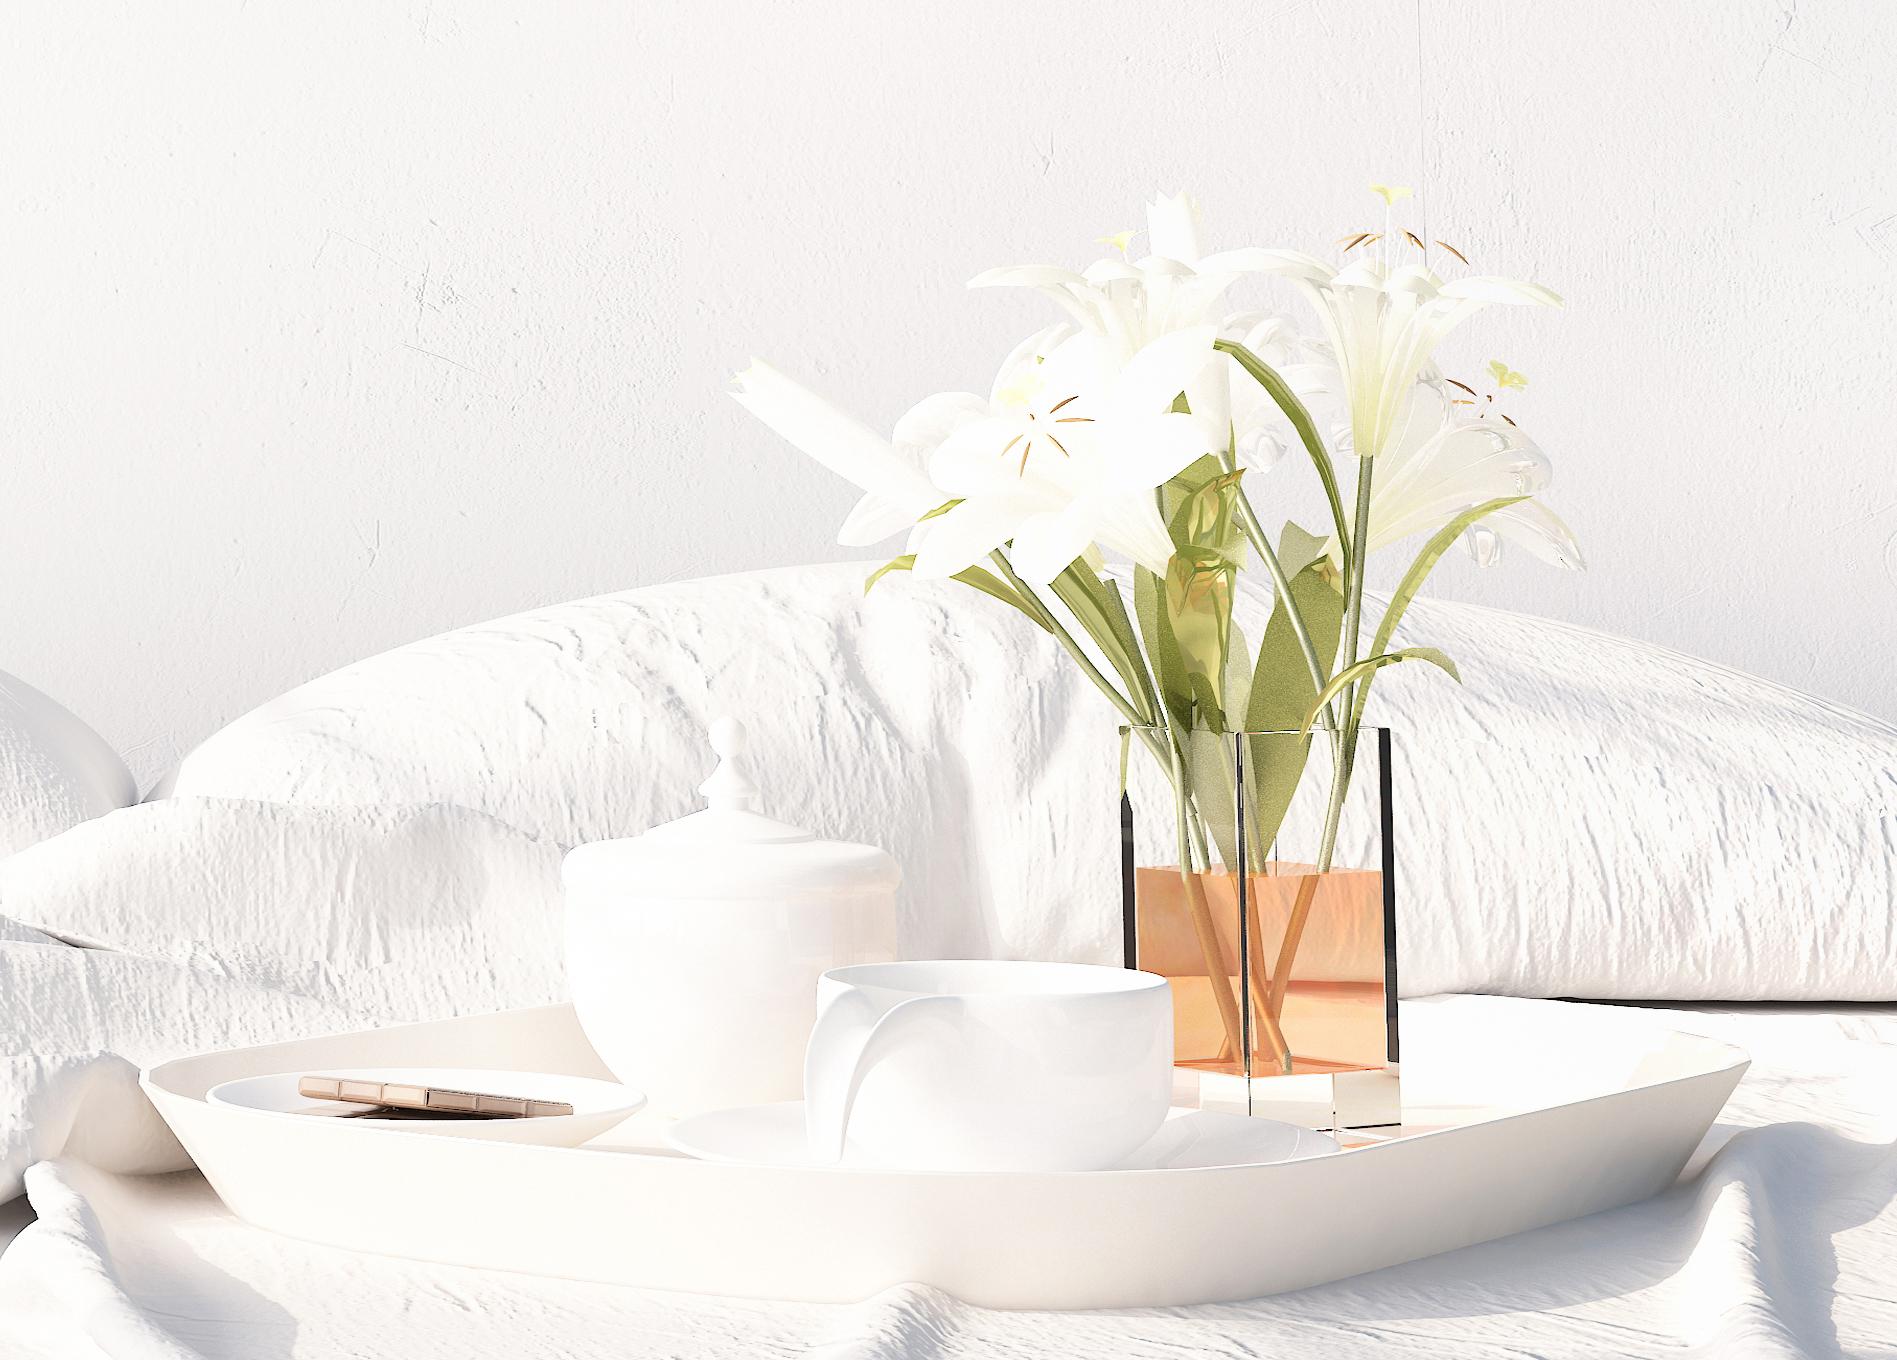 interior mockups bundle, stock photo example image 7